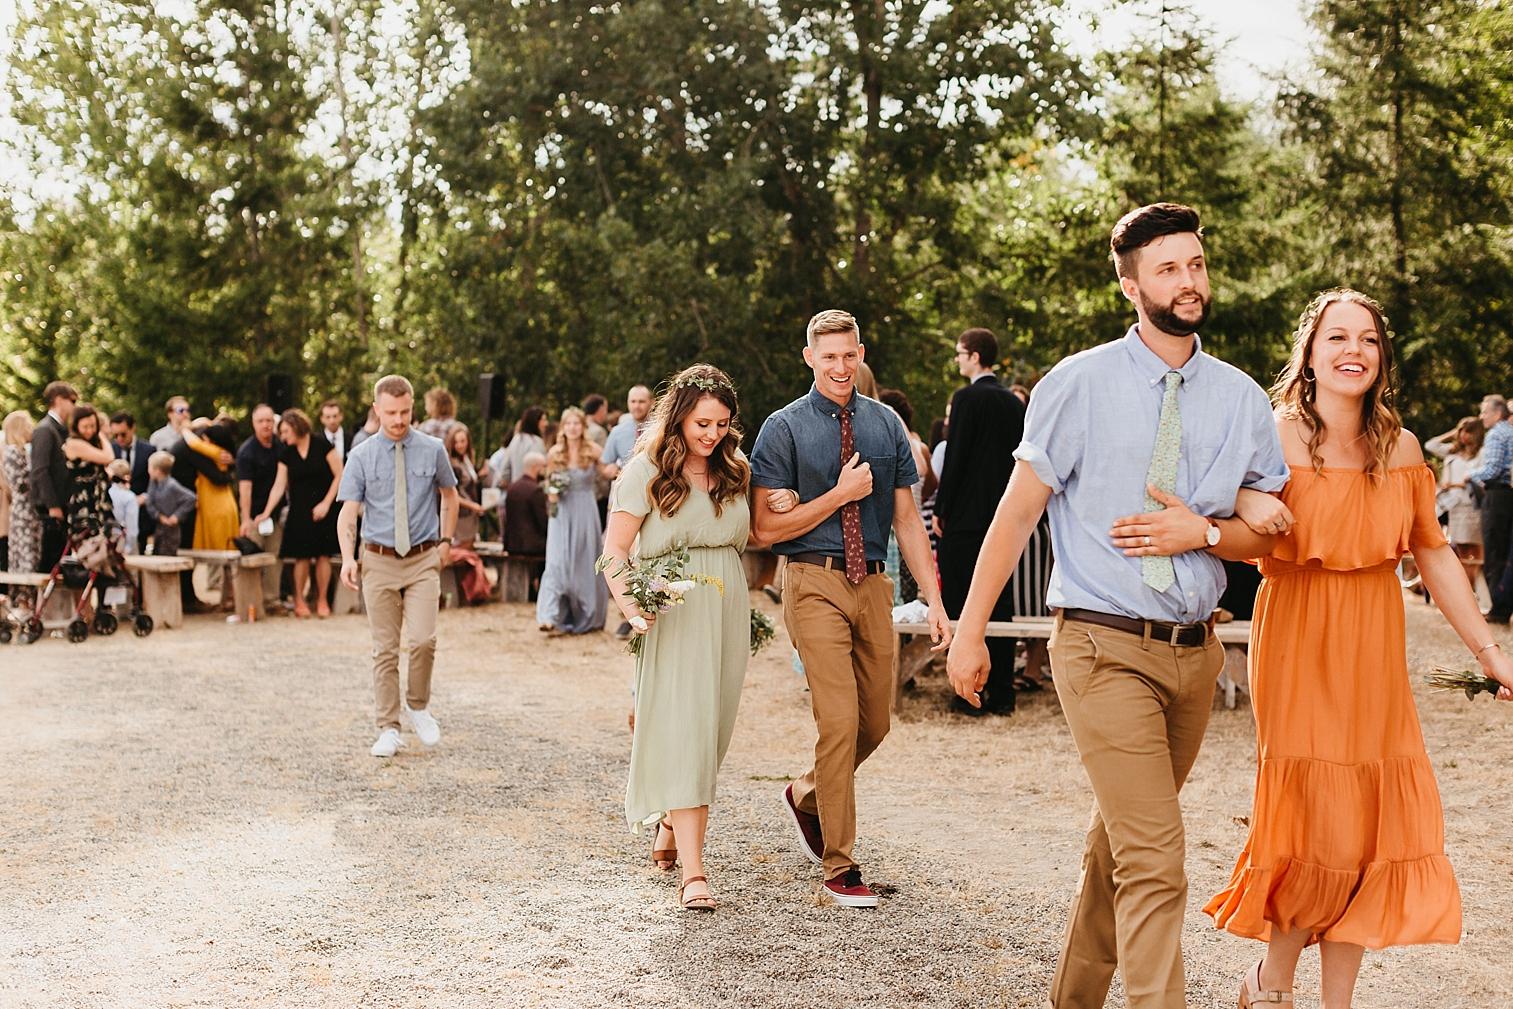 Summer-Camp-Themed-Wedding-109.jpg